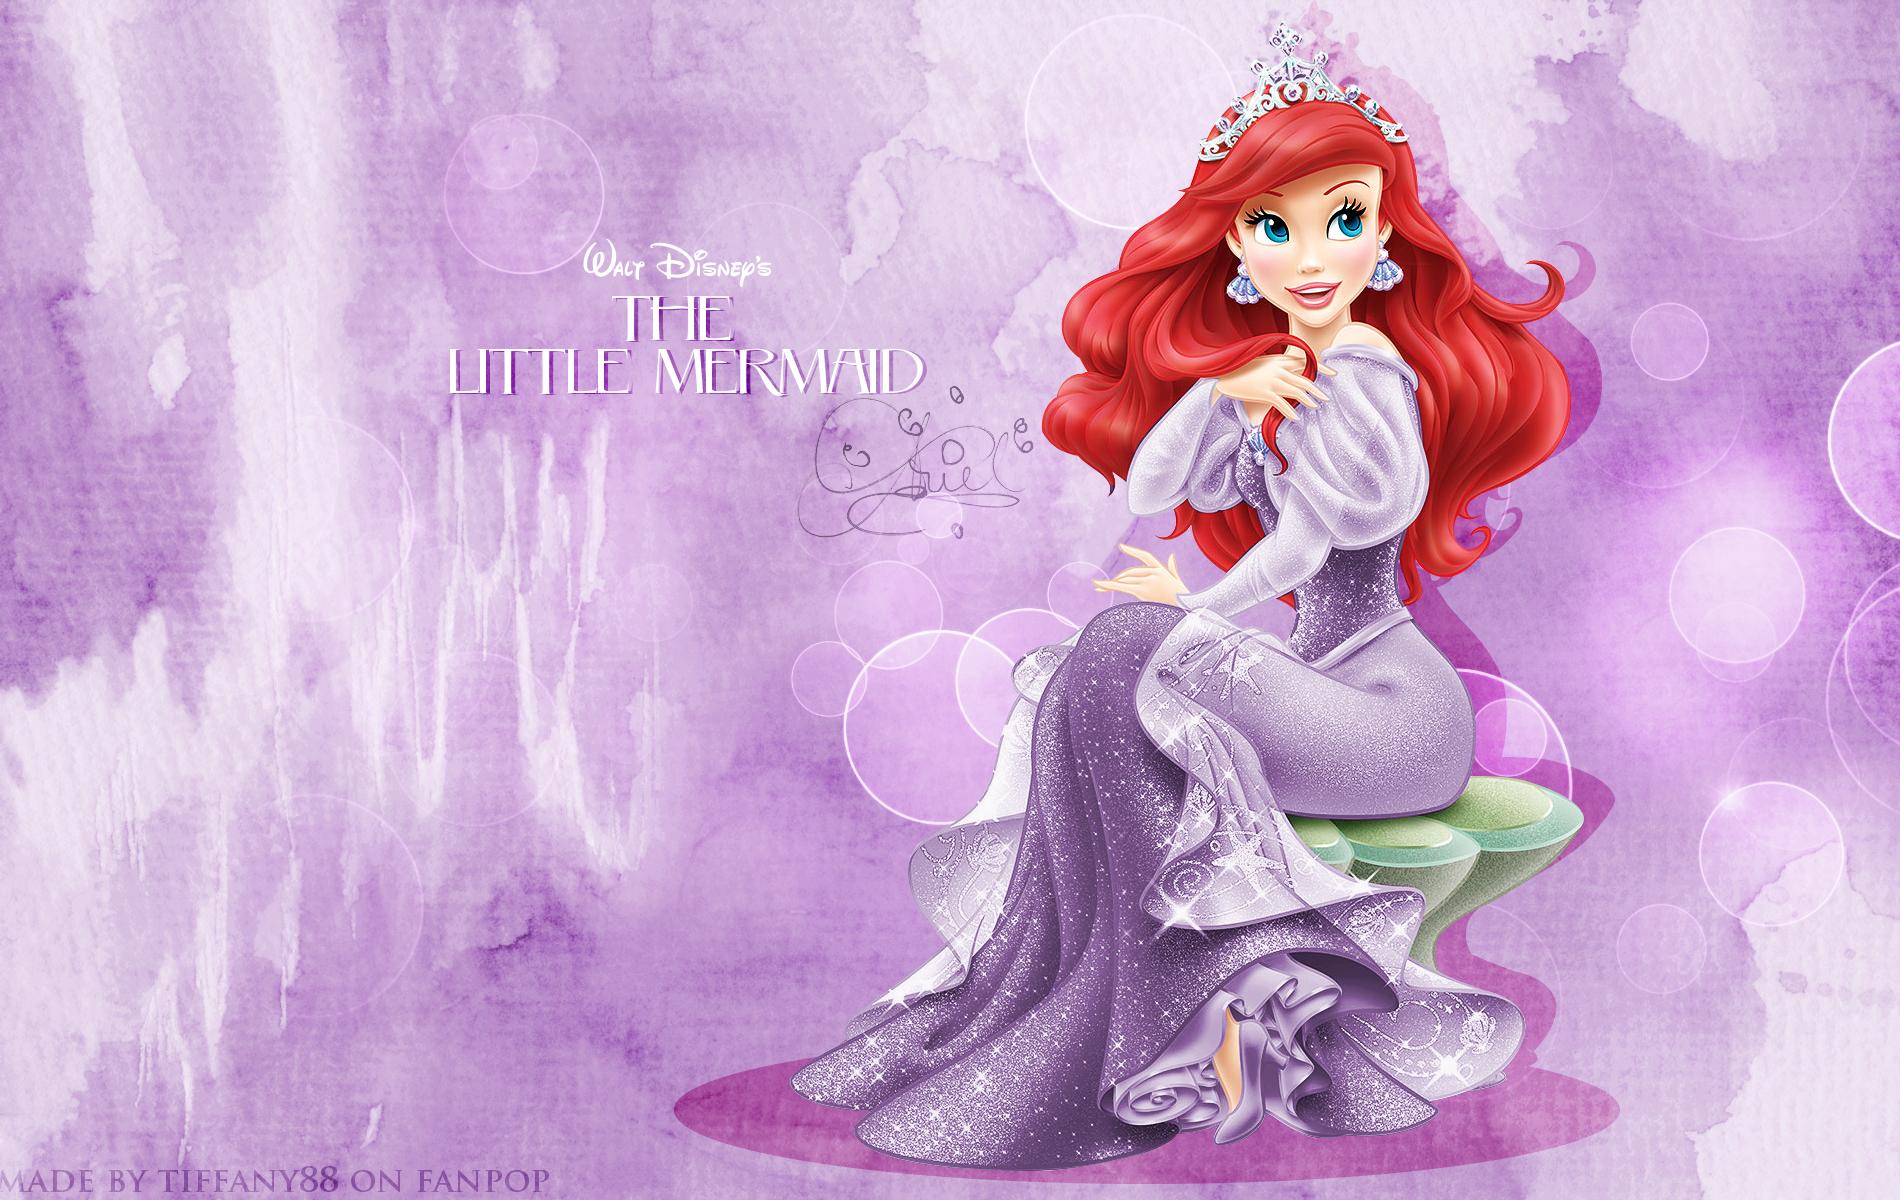 The dress ariel wore - Disney Princess Ariel Hd Wallpapers